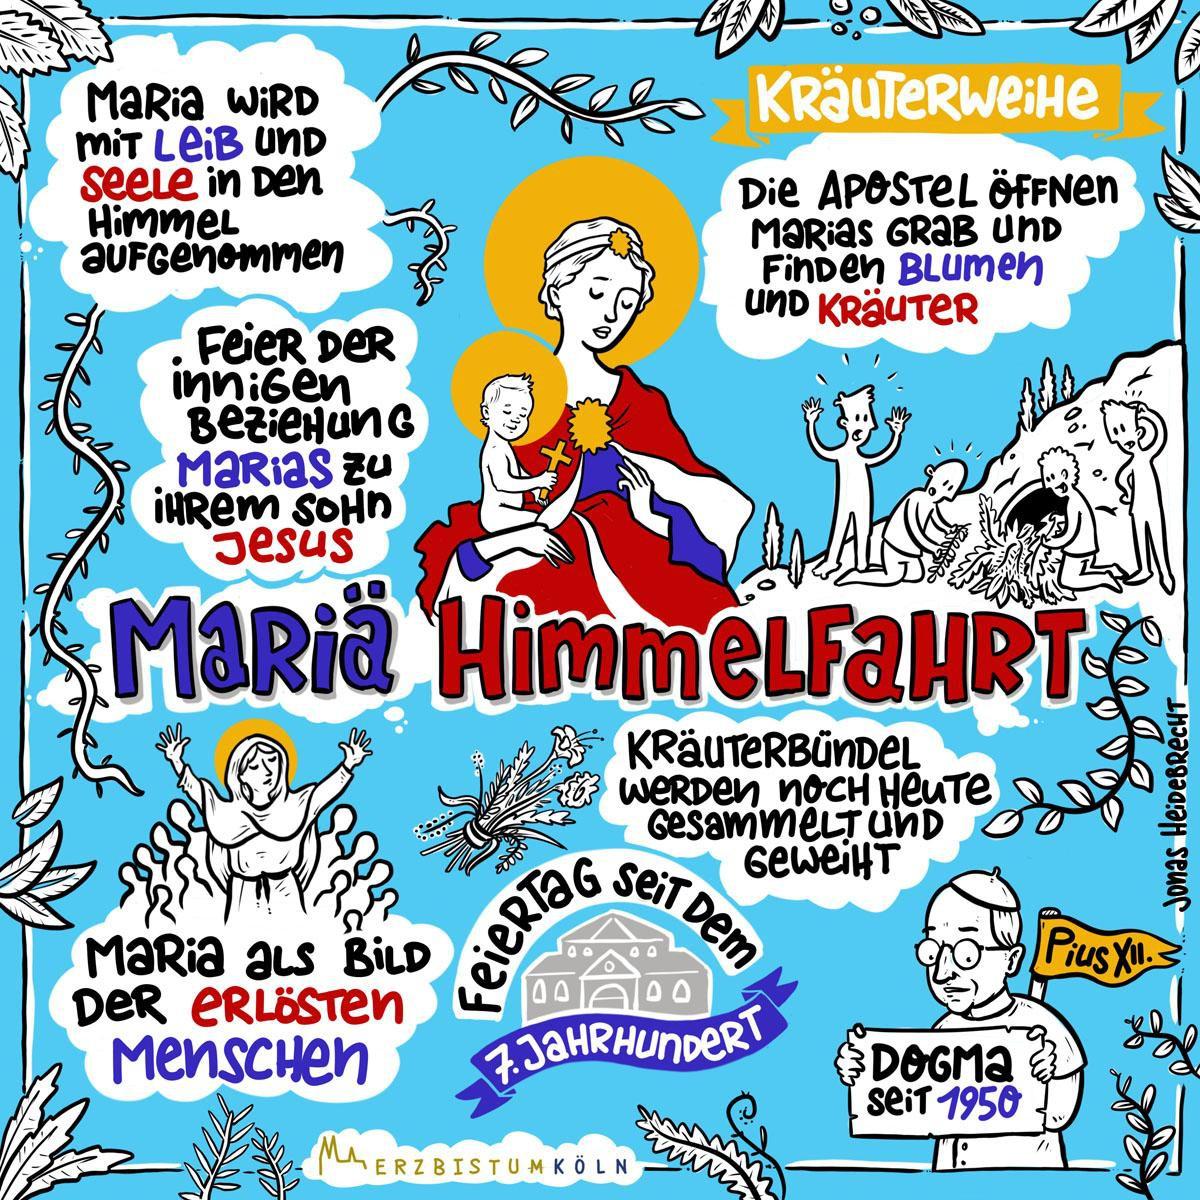 Mariae_Himmelfahrt